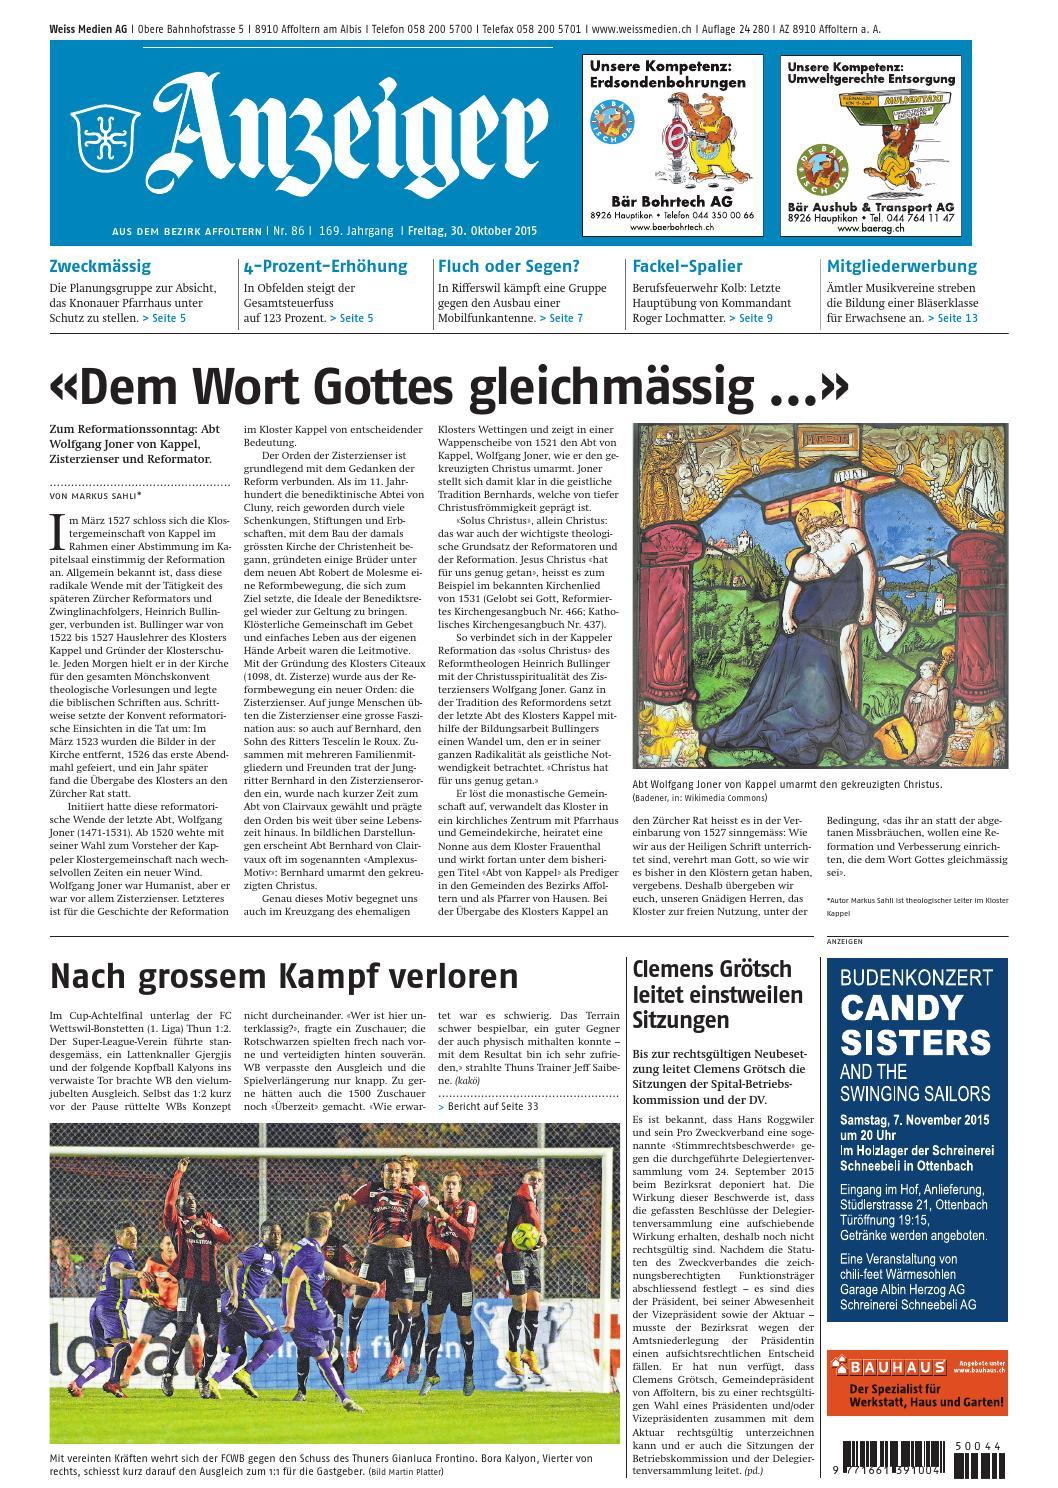 086 2015 by AZ-Anzeiger - issuu